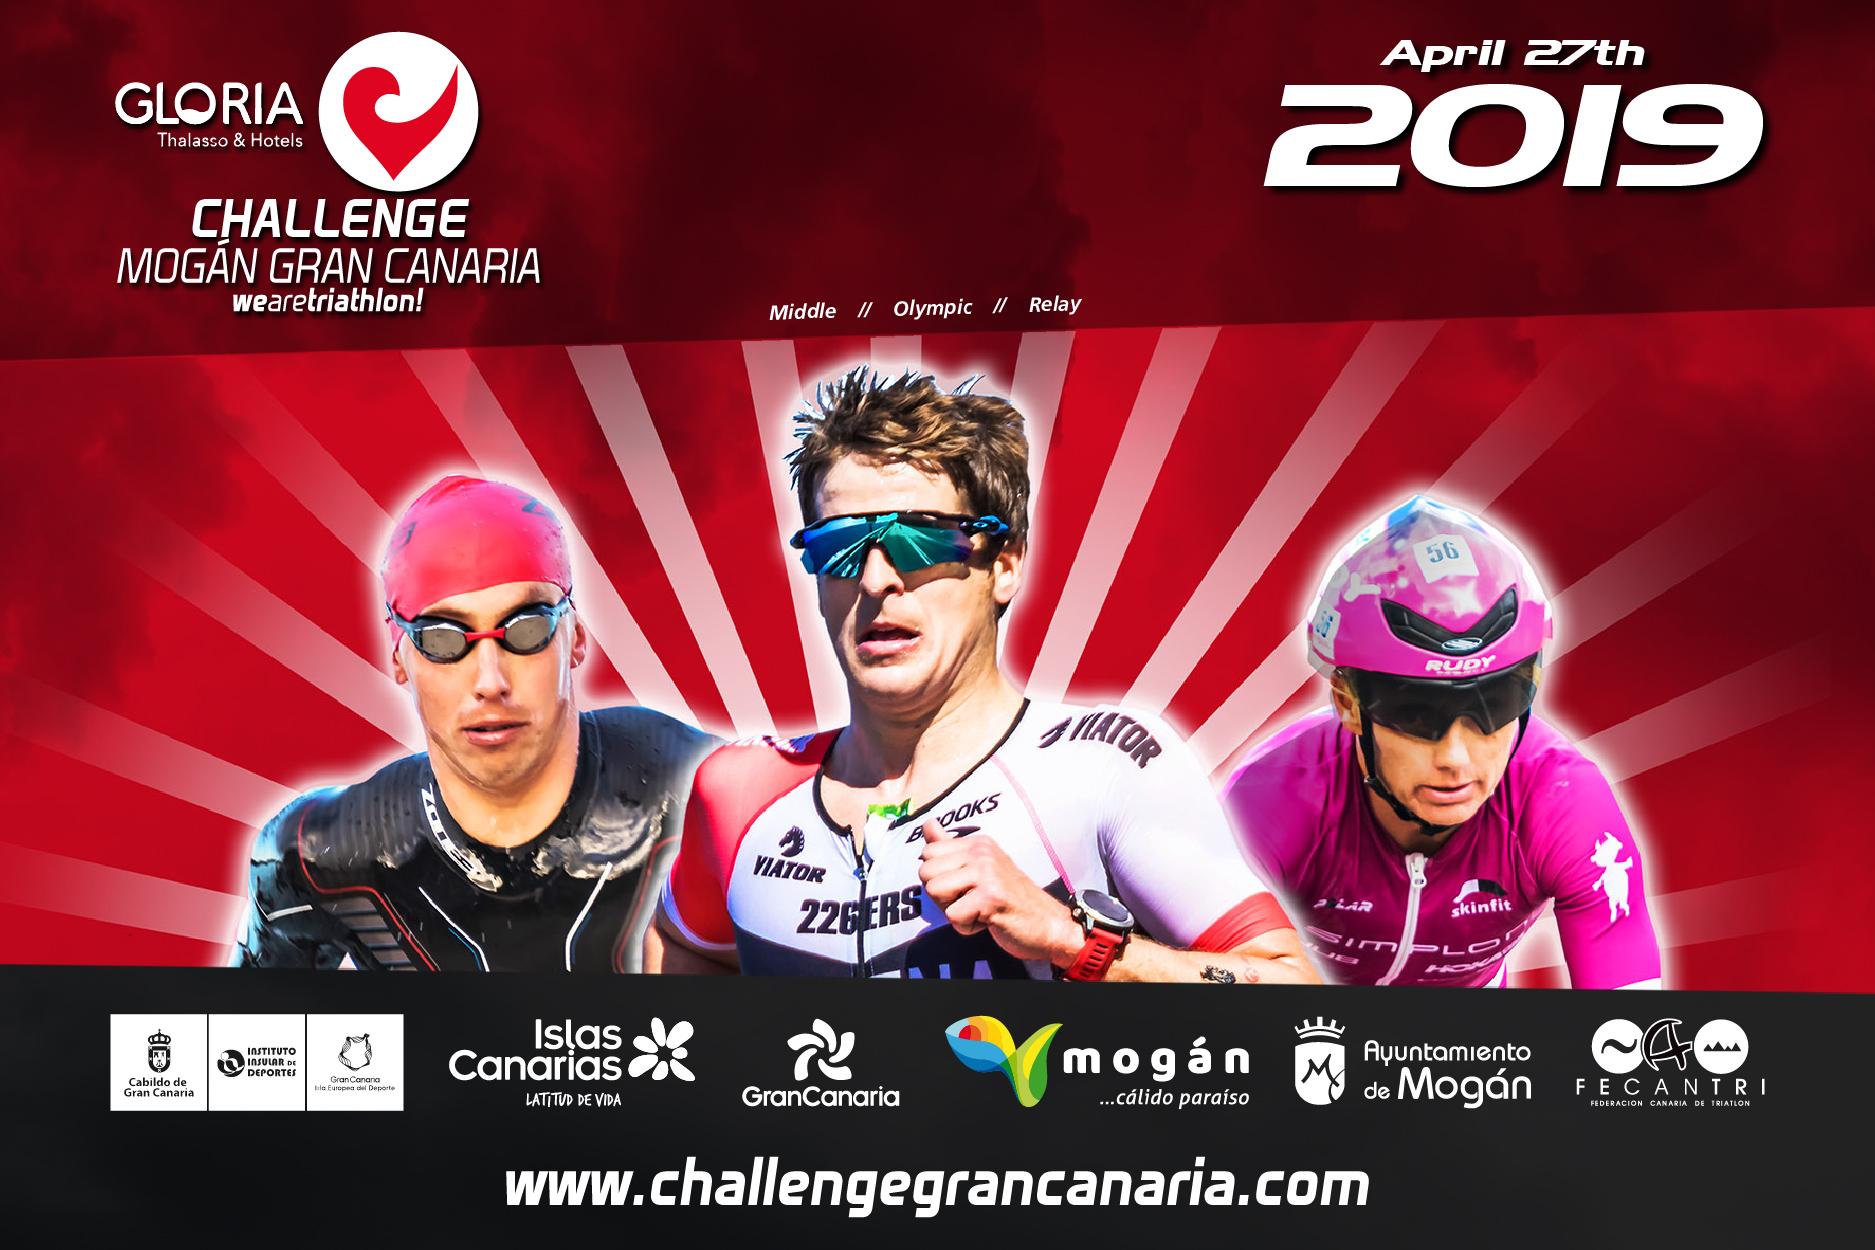 Triathlon Challenge Mogán Gran Canaria 2019